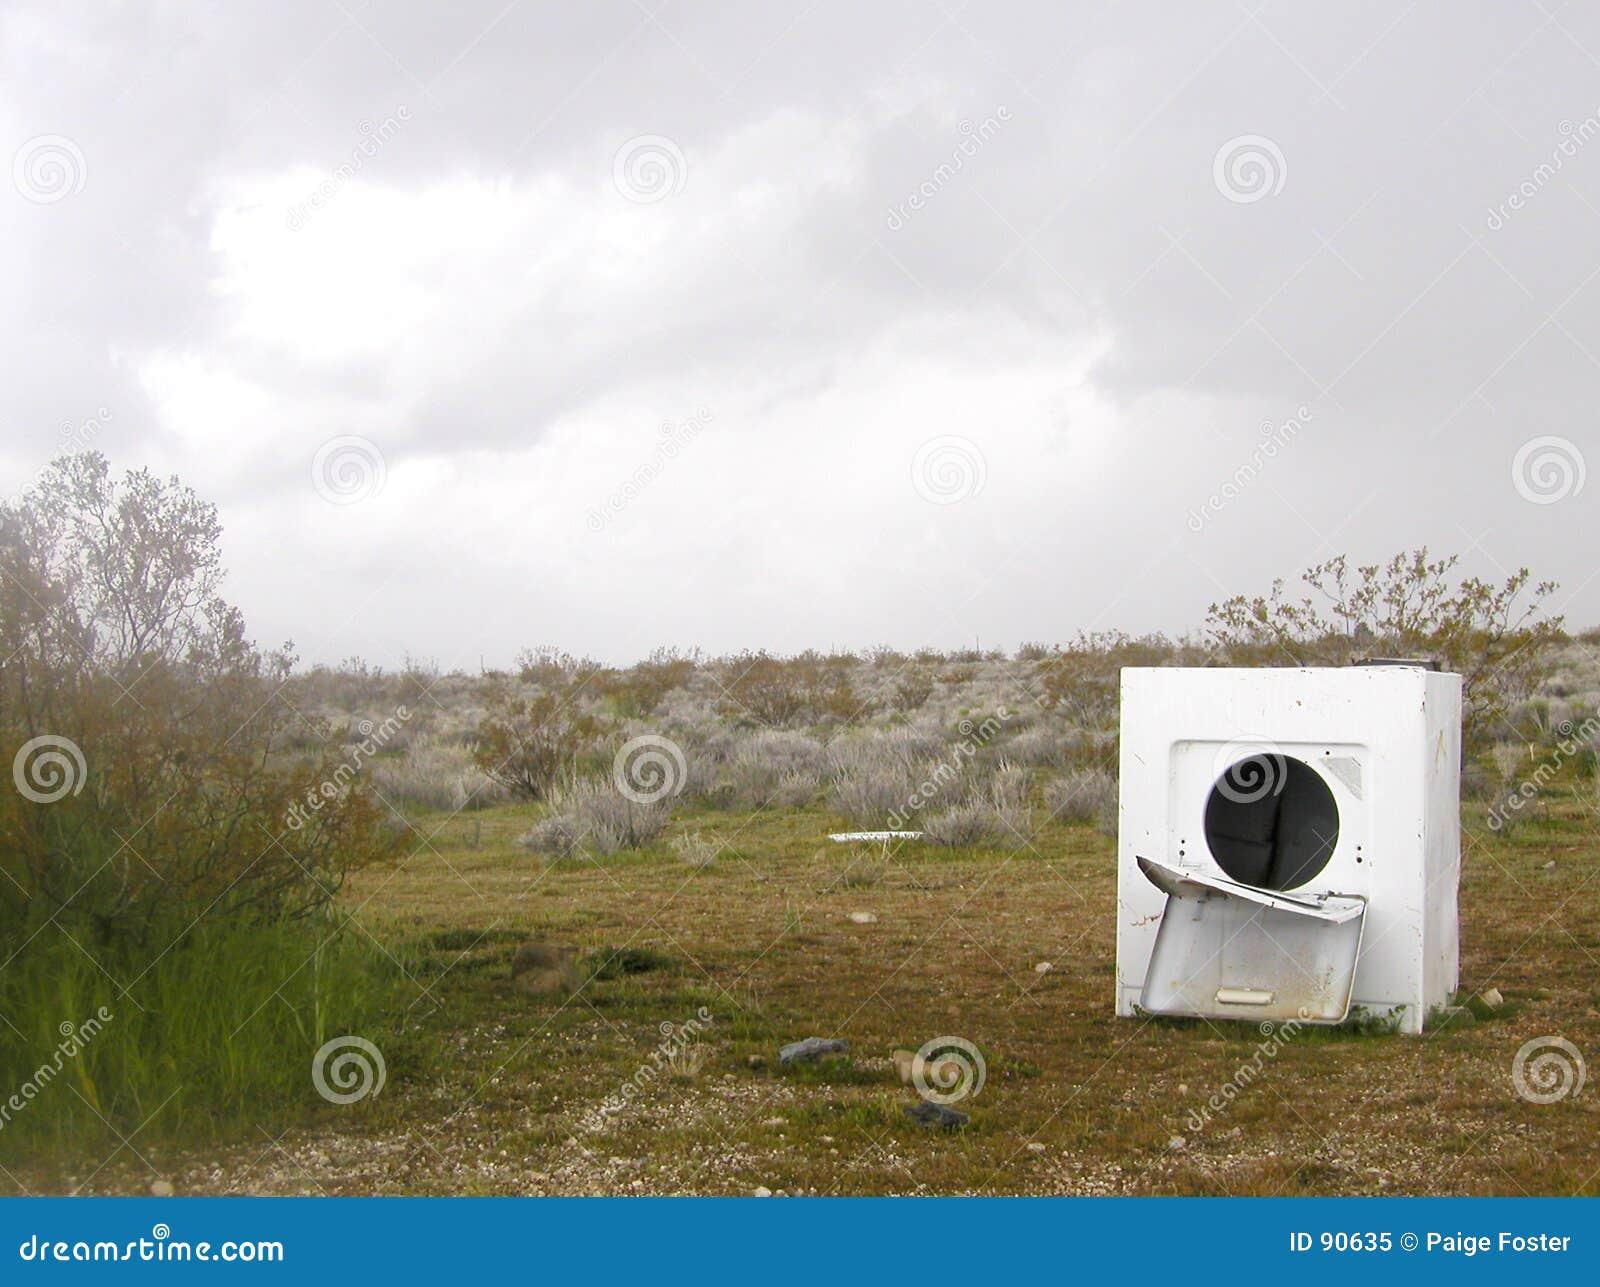 verlassene scheibe lizenzfreies stockfoto bild 90635. Black Bedroom Furniture Sets. Home Design Ideas